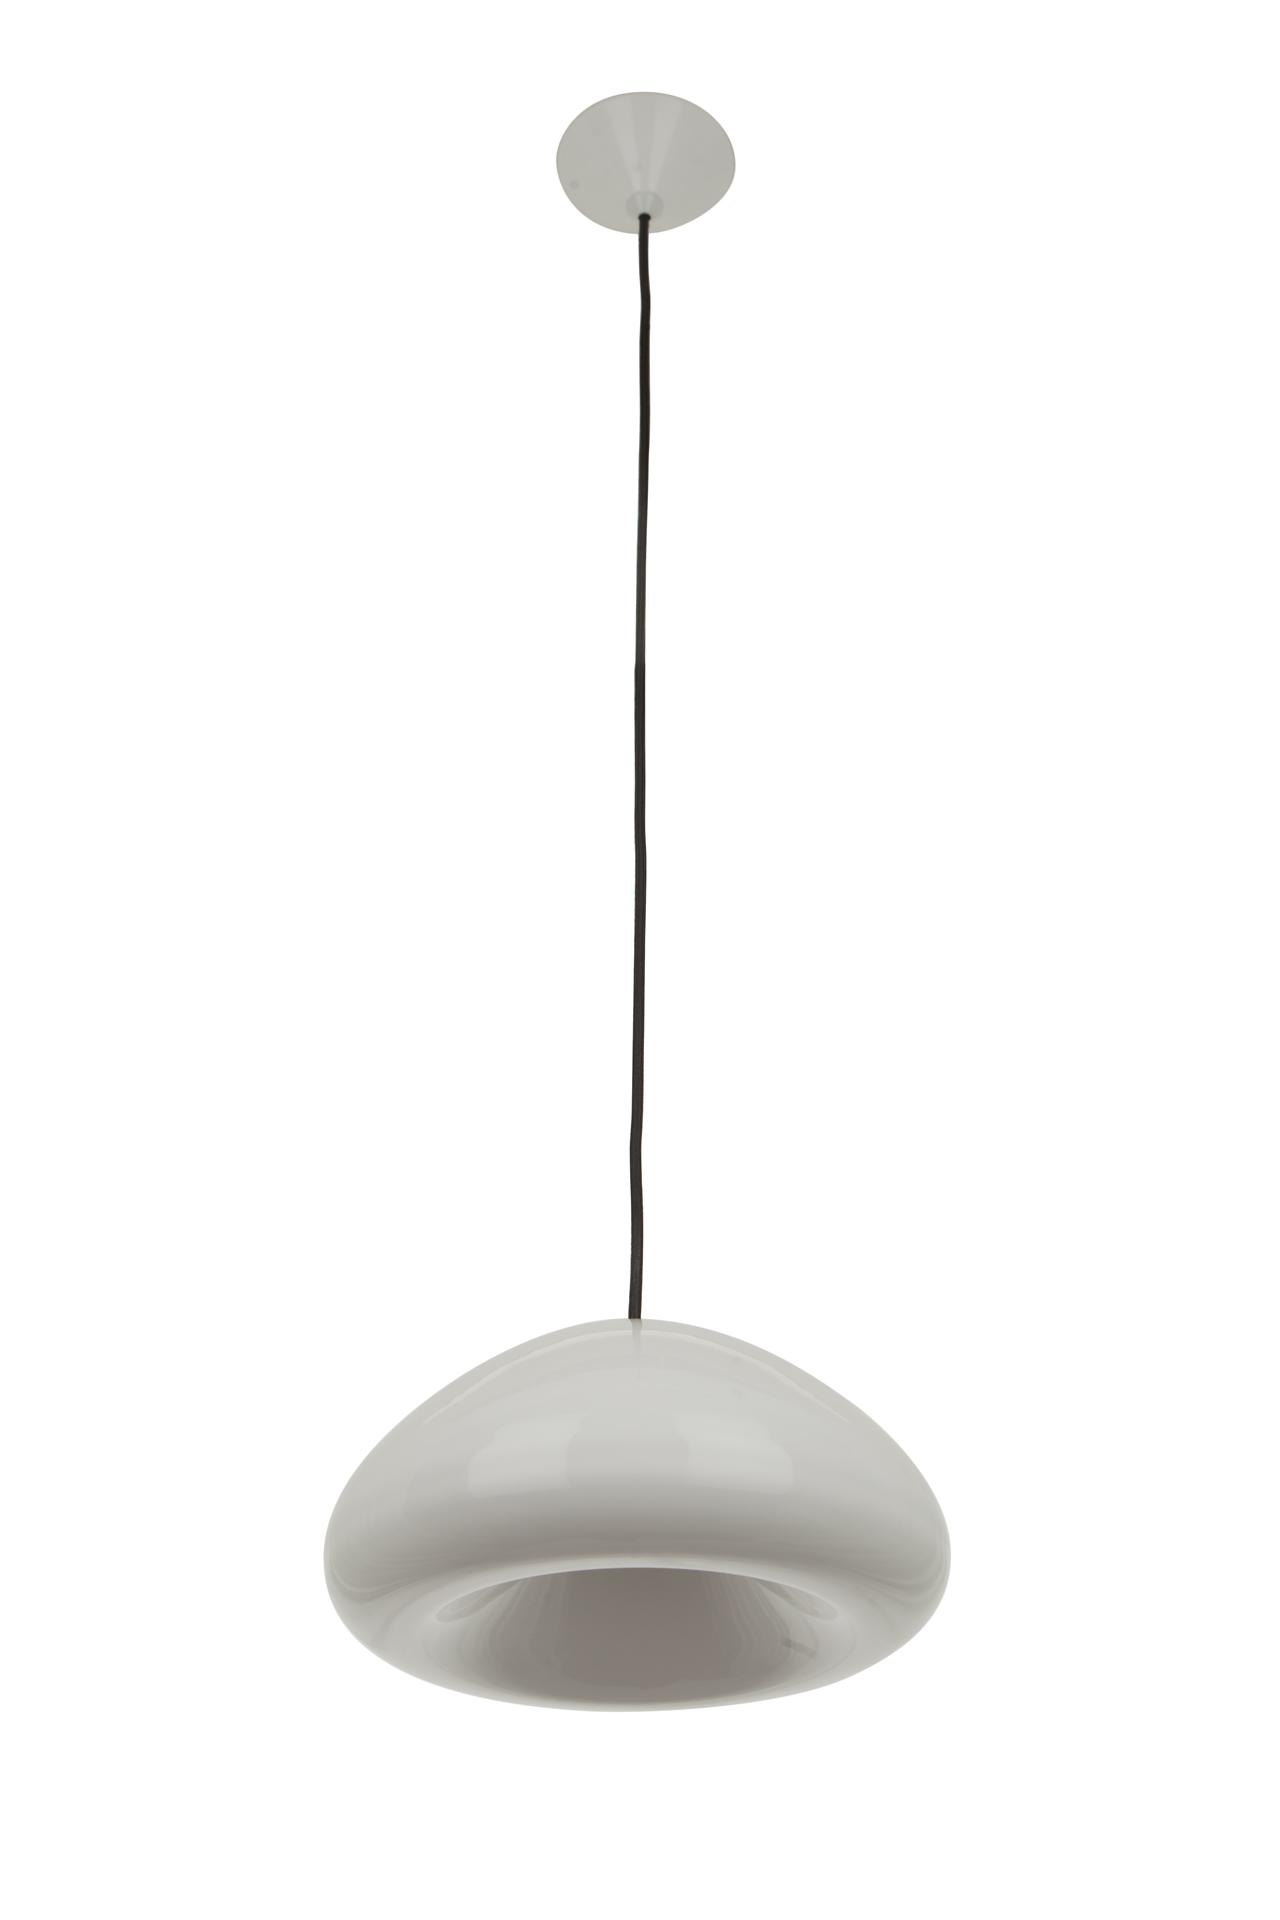 {} CRYSTAL LIGHT Светильник подвесной Void Light (20х30 см) подвесной светильник cosmo void 2441